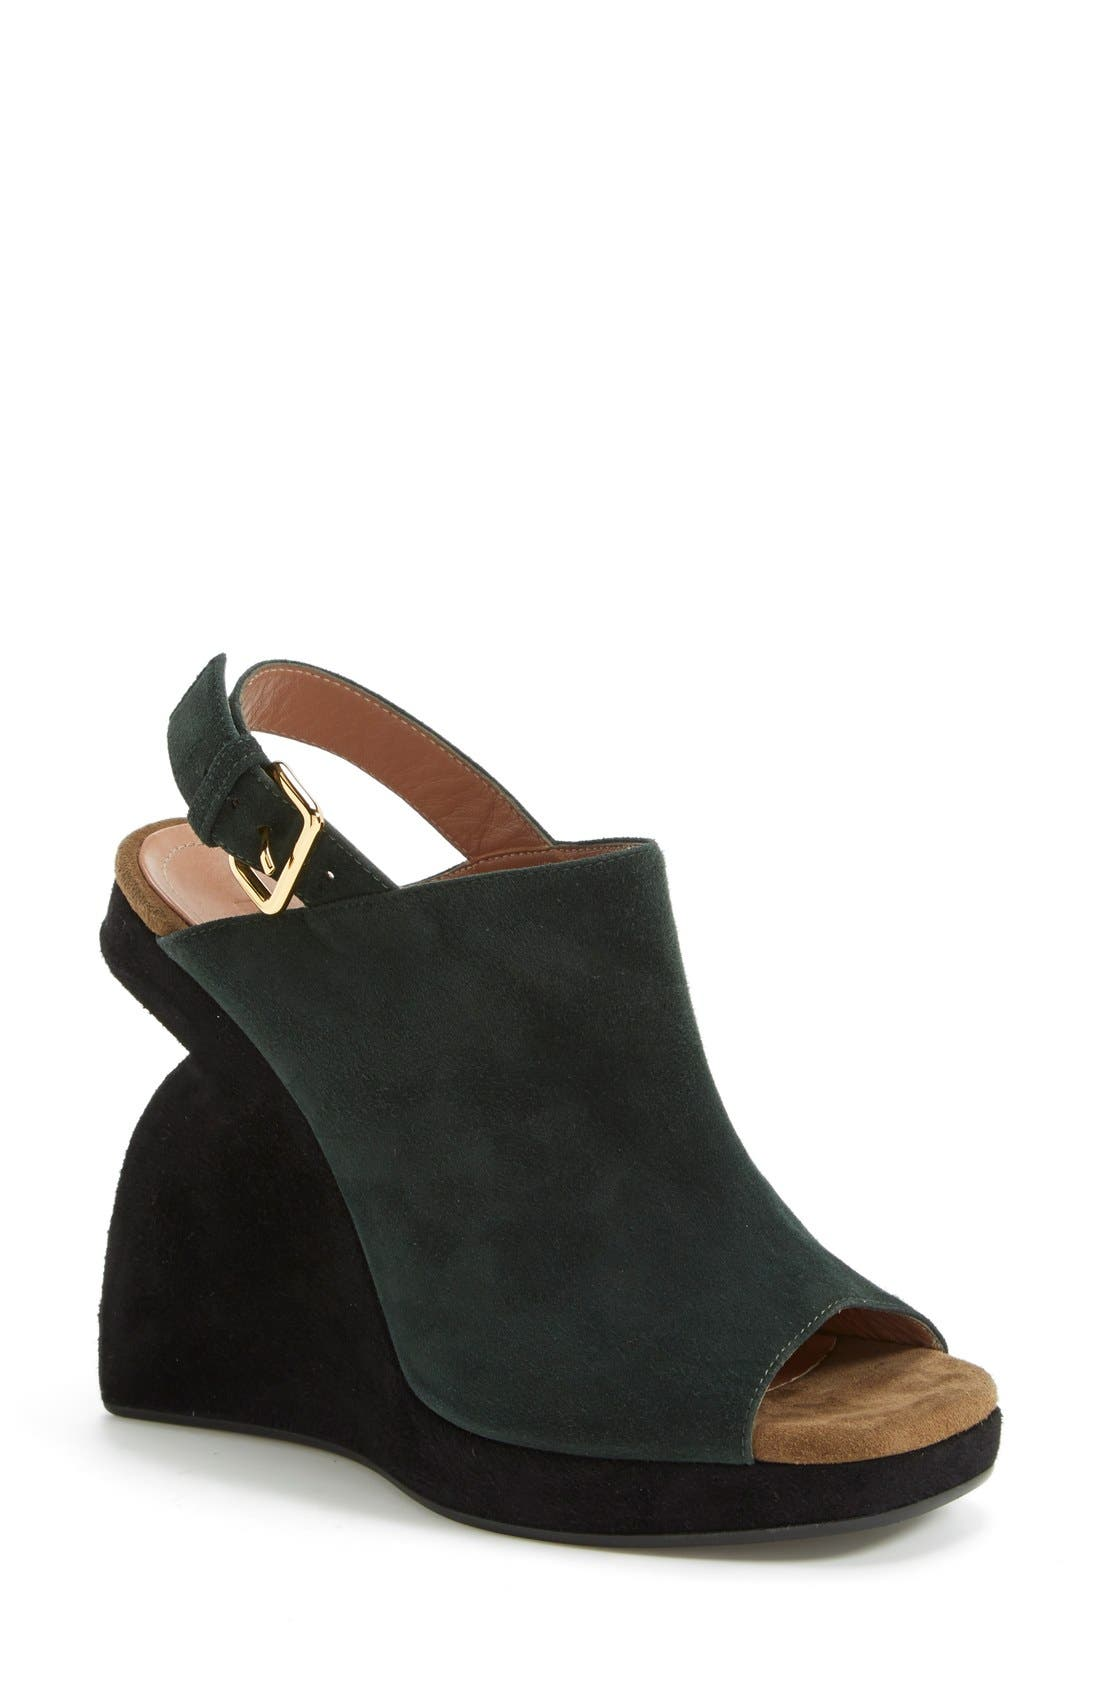 Main Image - Marni Slingback Wedge Sandal (Women)